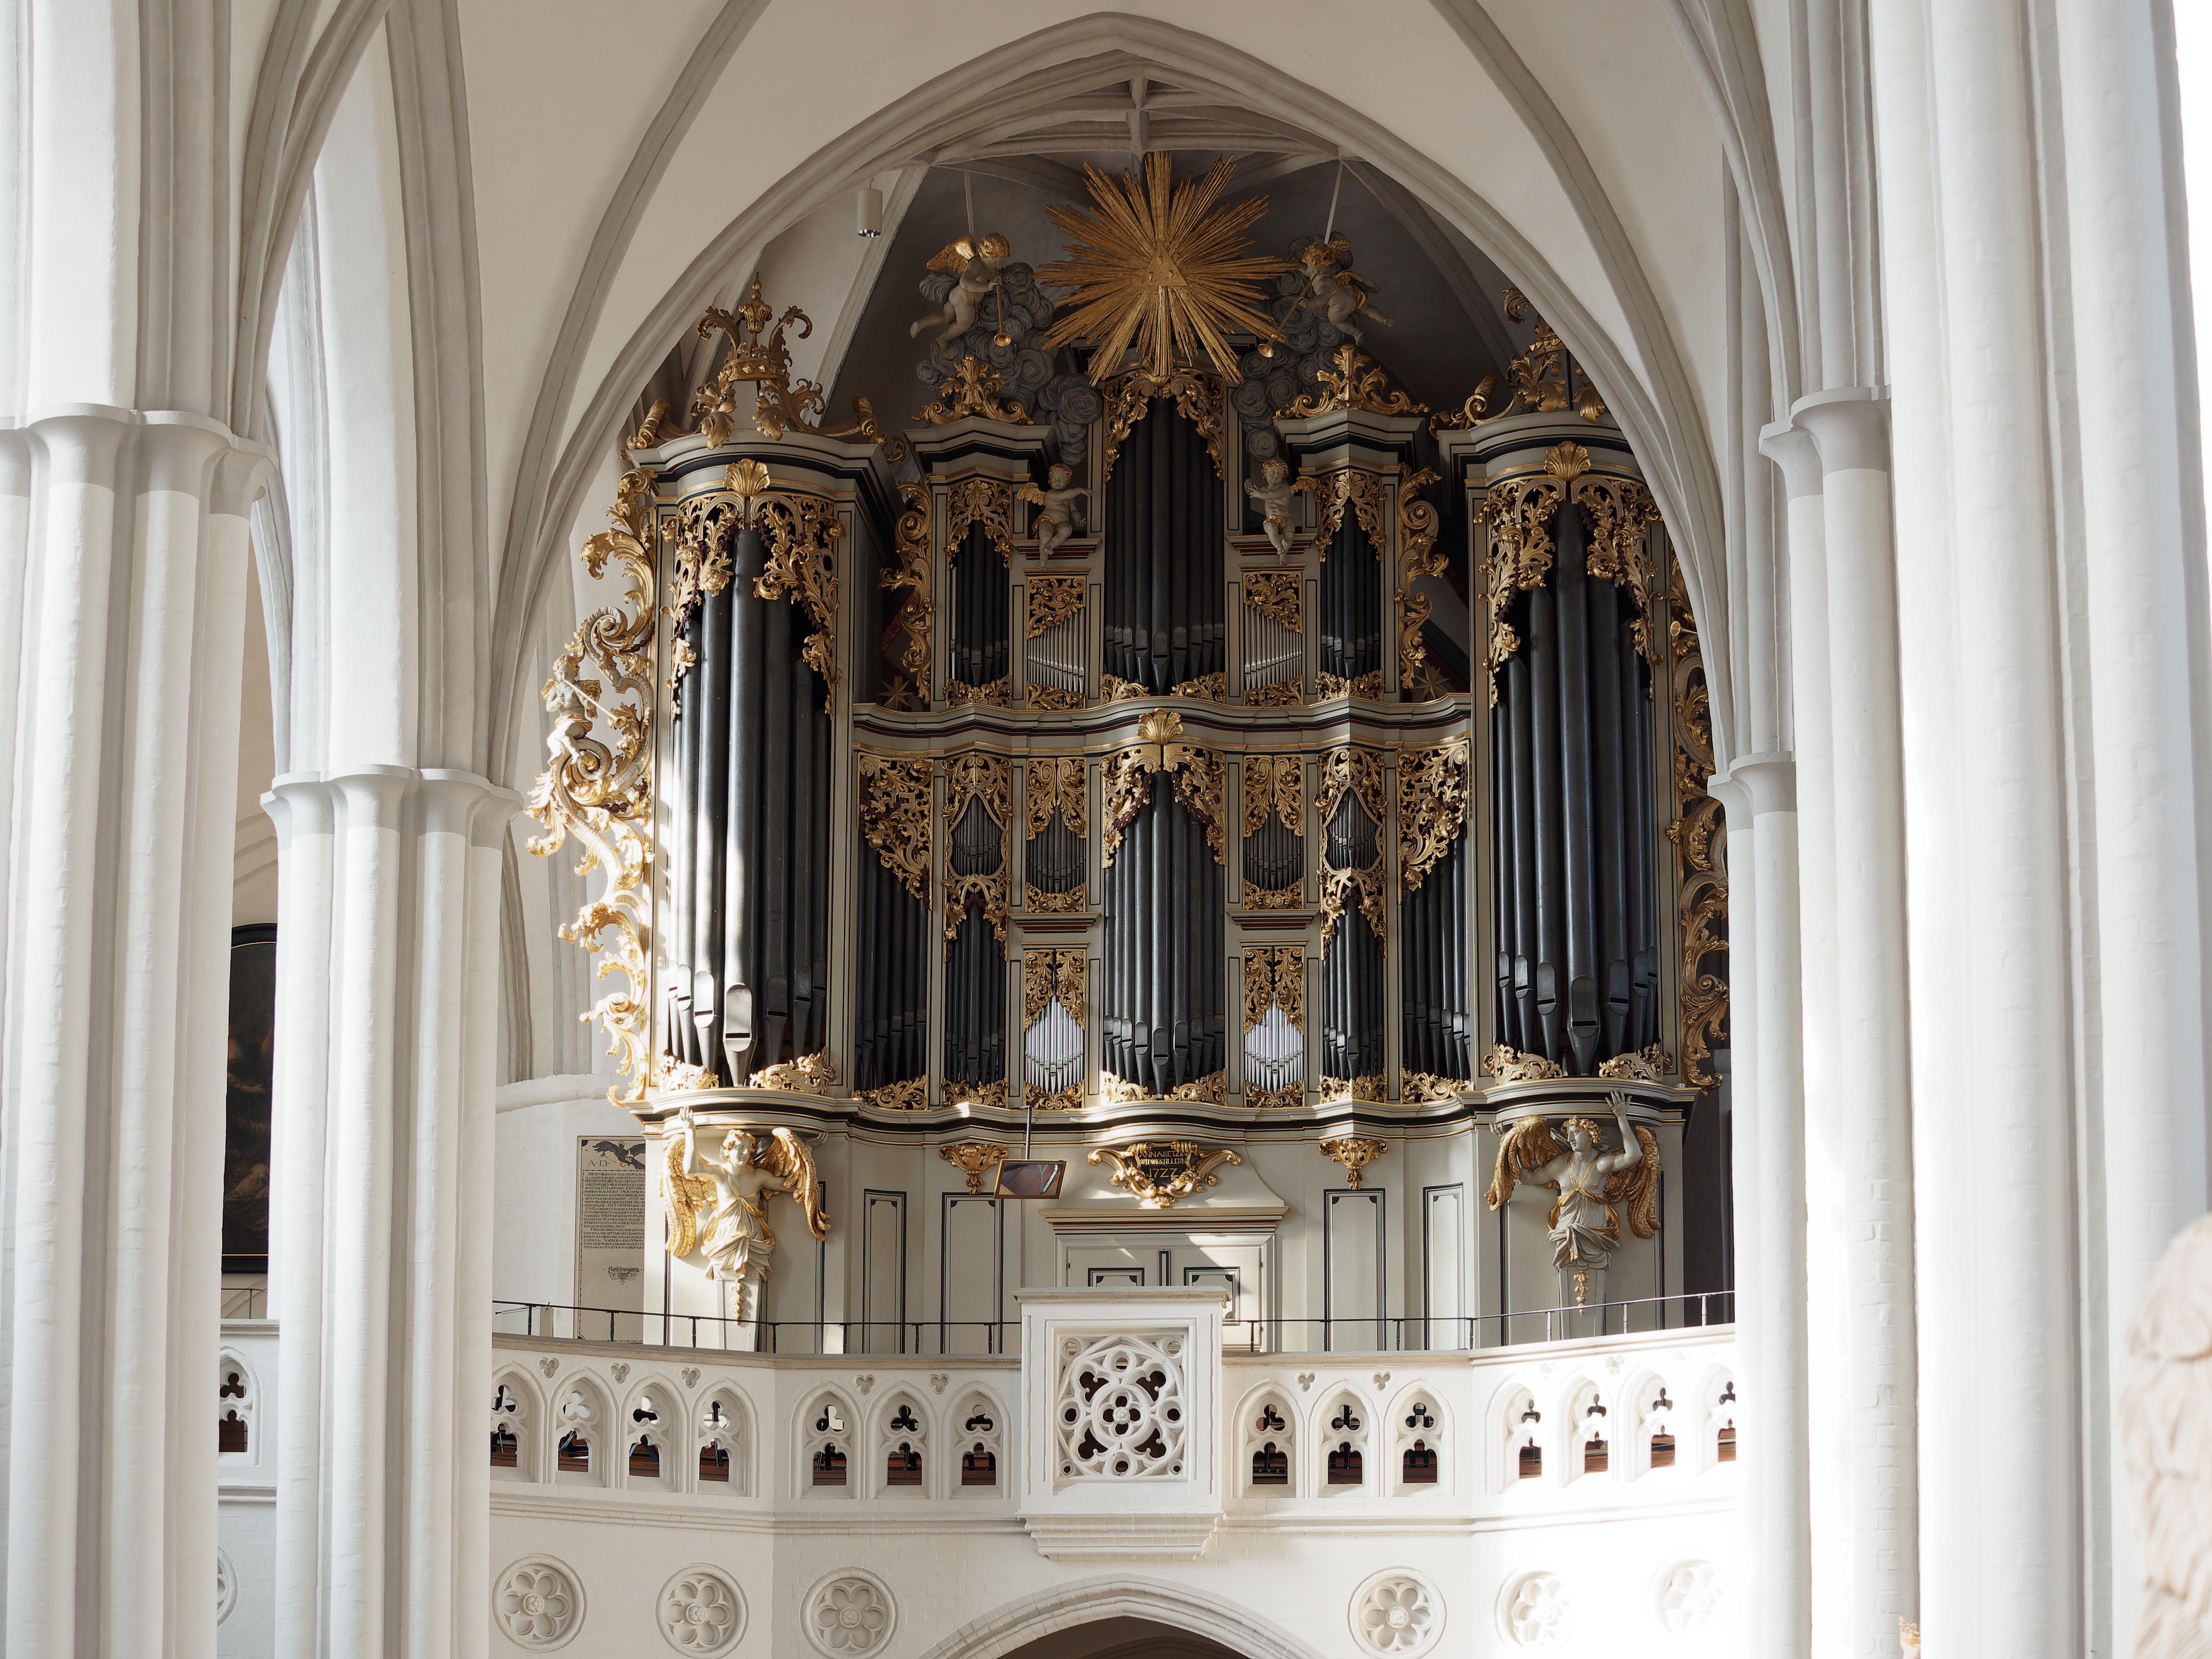 File:Berlin-Mitte Marienkirche organ.jpg